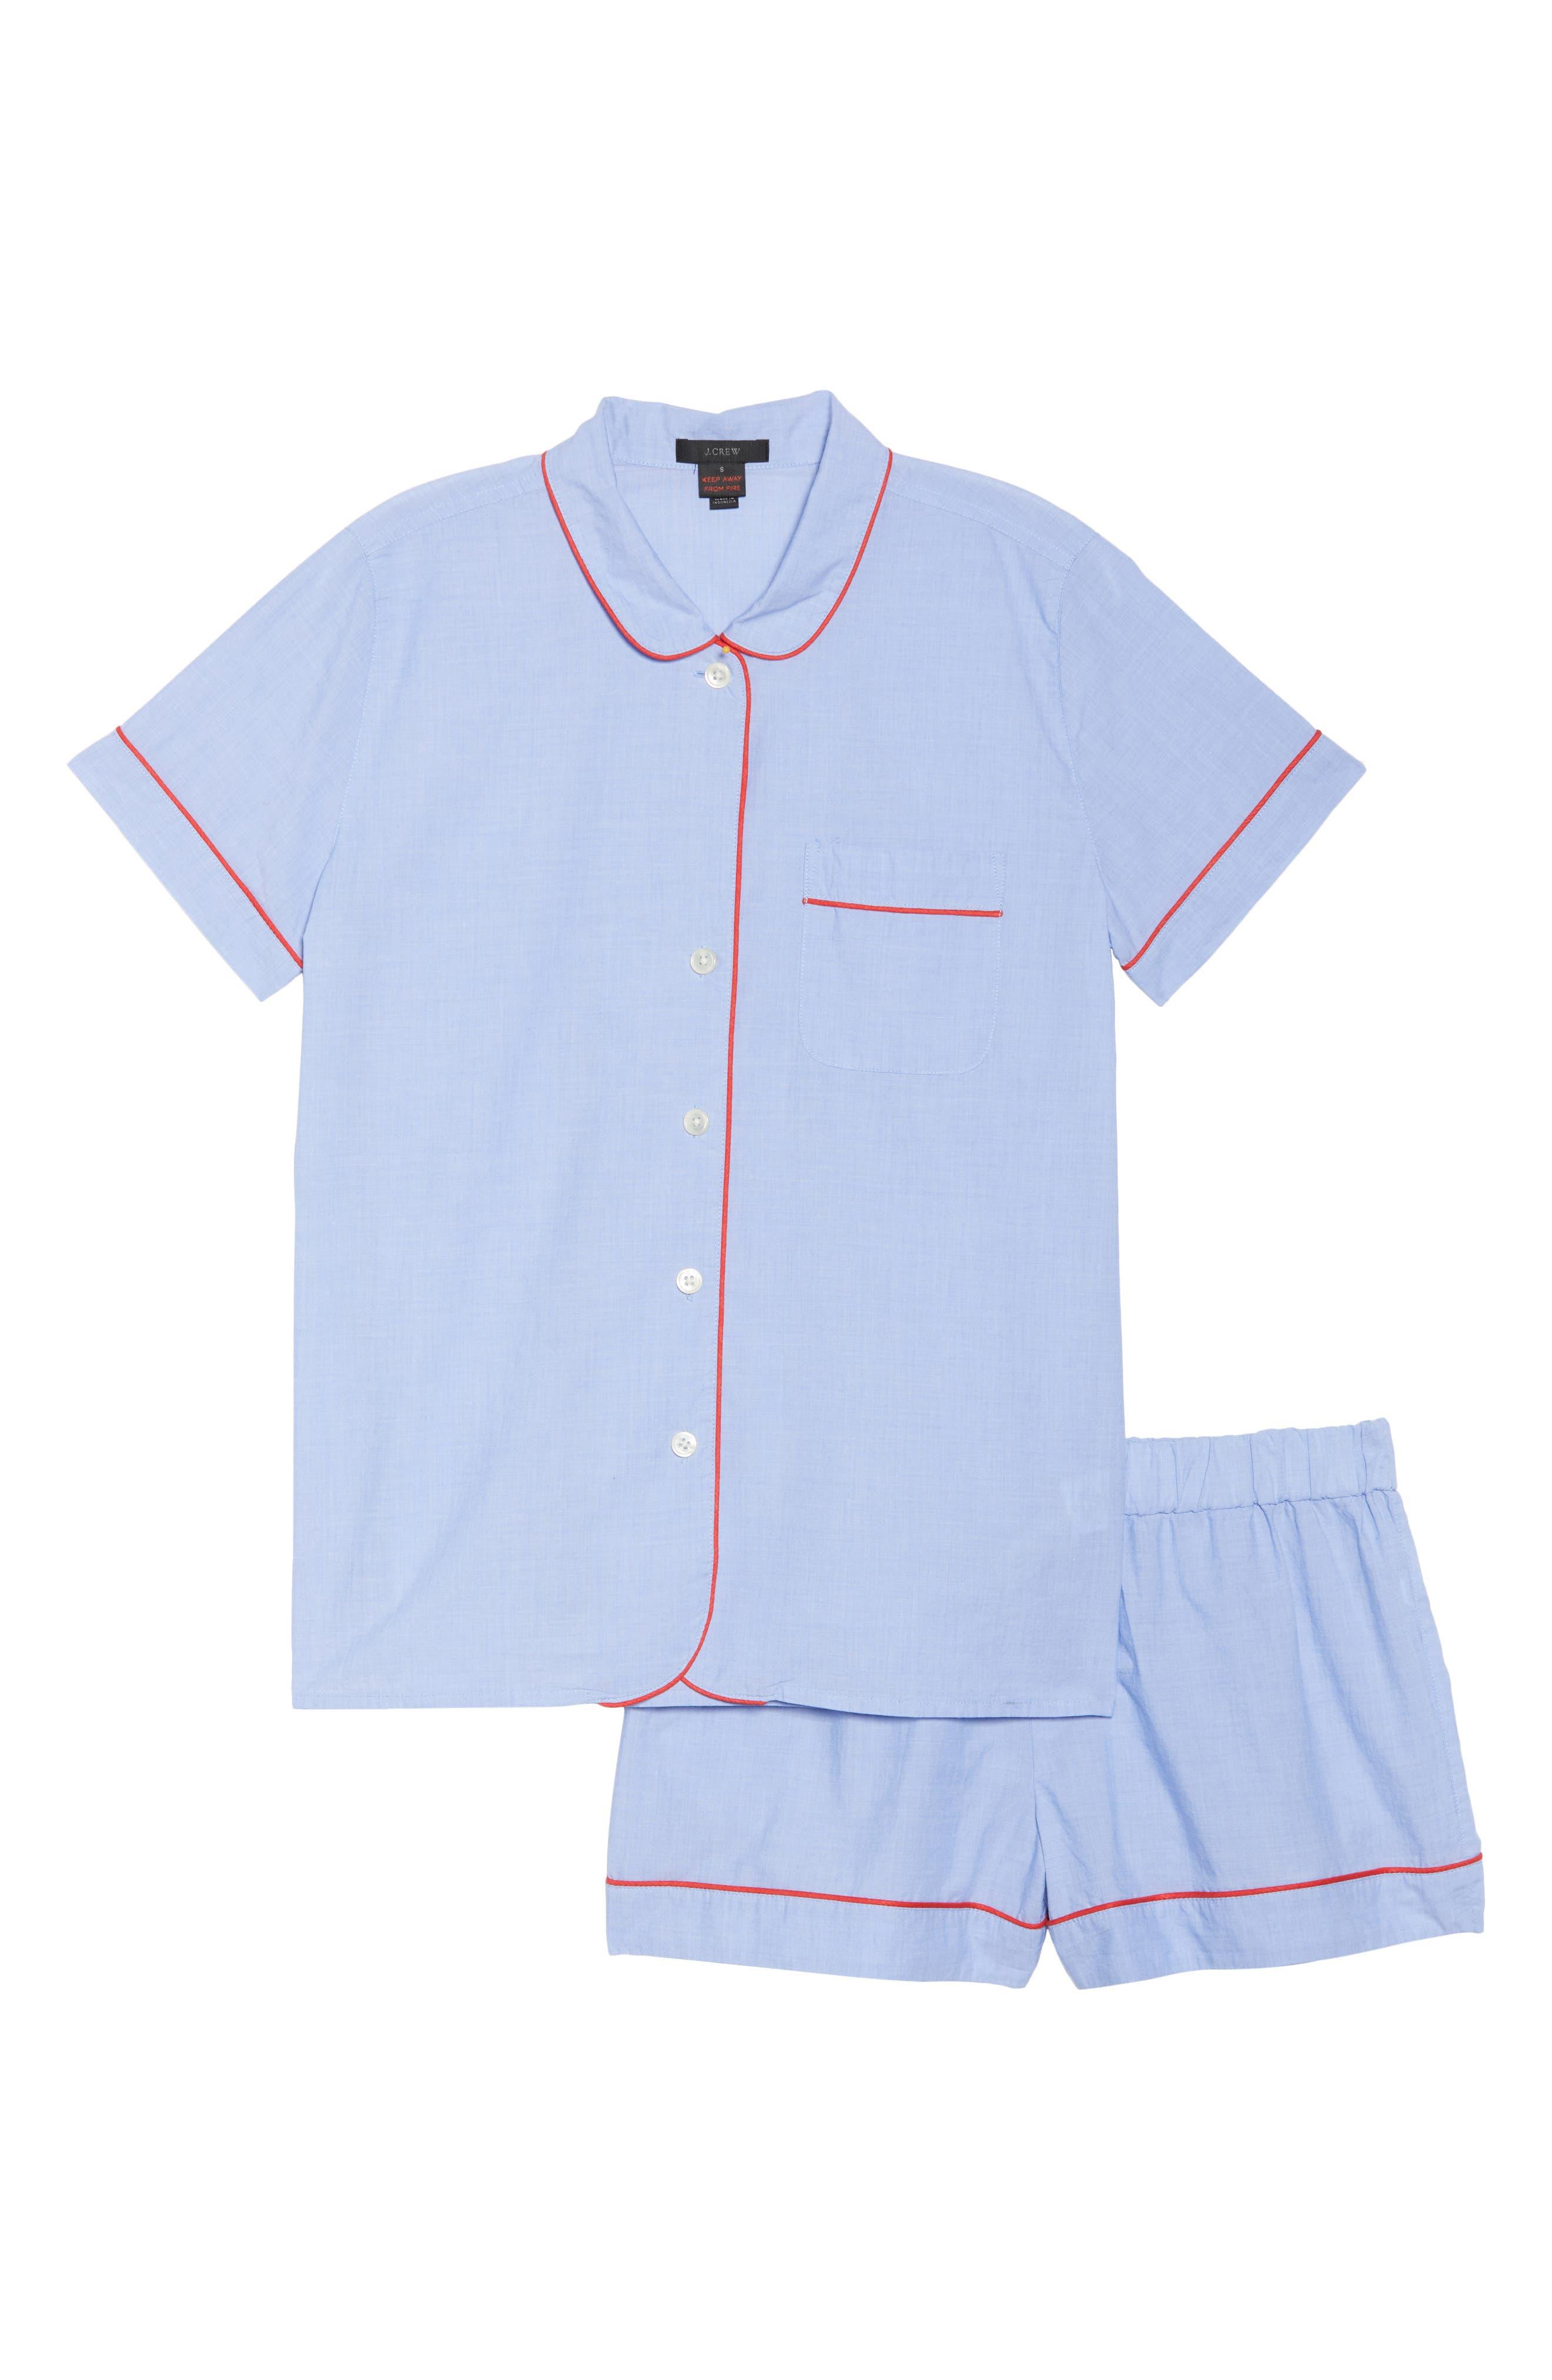 J.CREW,                             Tipped Pajama Set,                             Alternate thumbnail 6, color,                             411